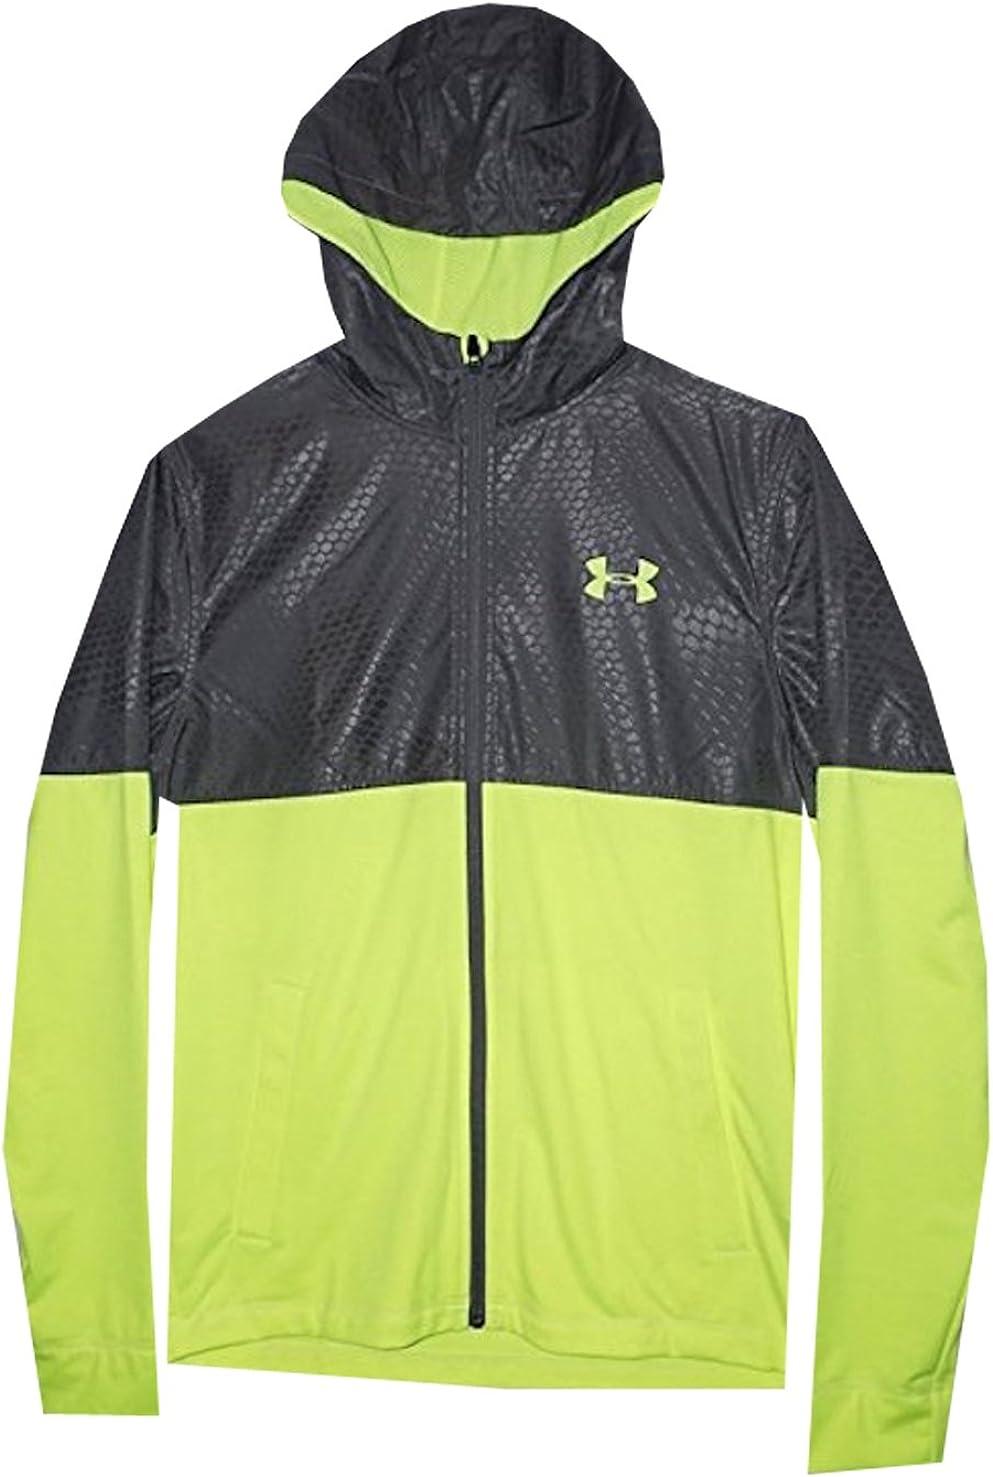 mostaza Vuelo cruzar  Amazon.com: Under Armour Men All Season Gear Lightweight Full Zip Jacket  (M, Graphite/high vis Yellow): Clothing